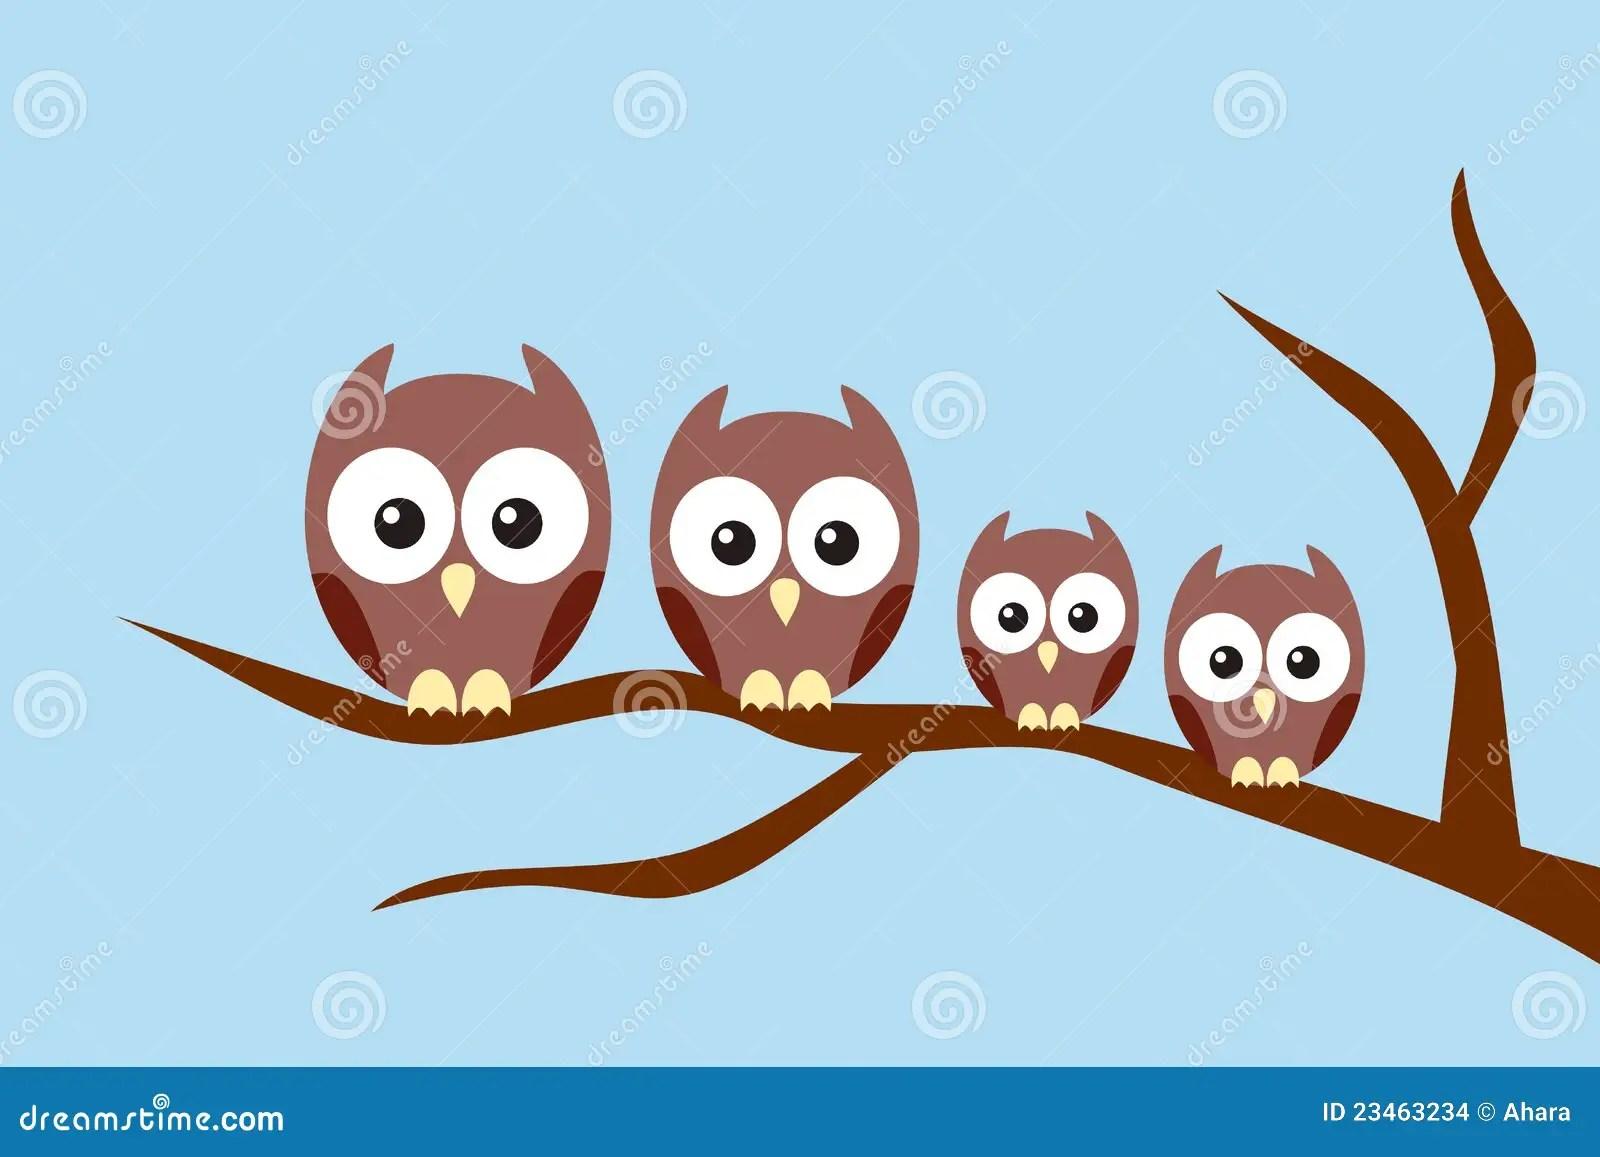 Animal Print Desktop Wallpaper Owl Family Stock Images Image 23463234